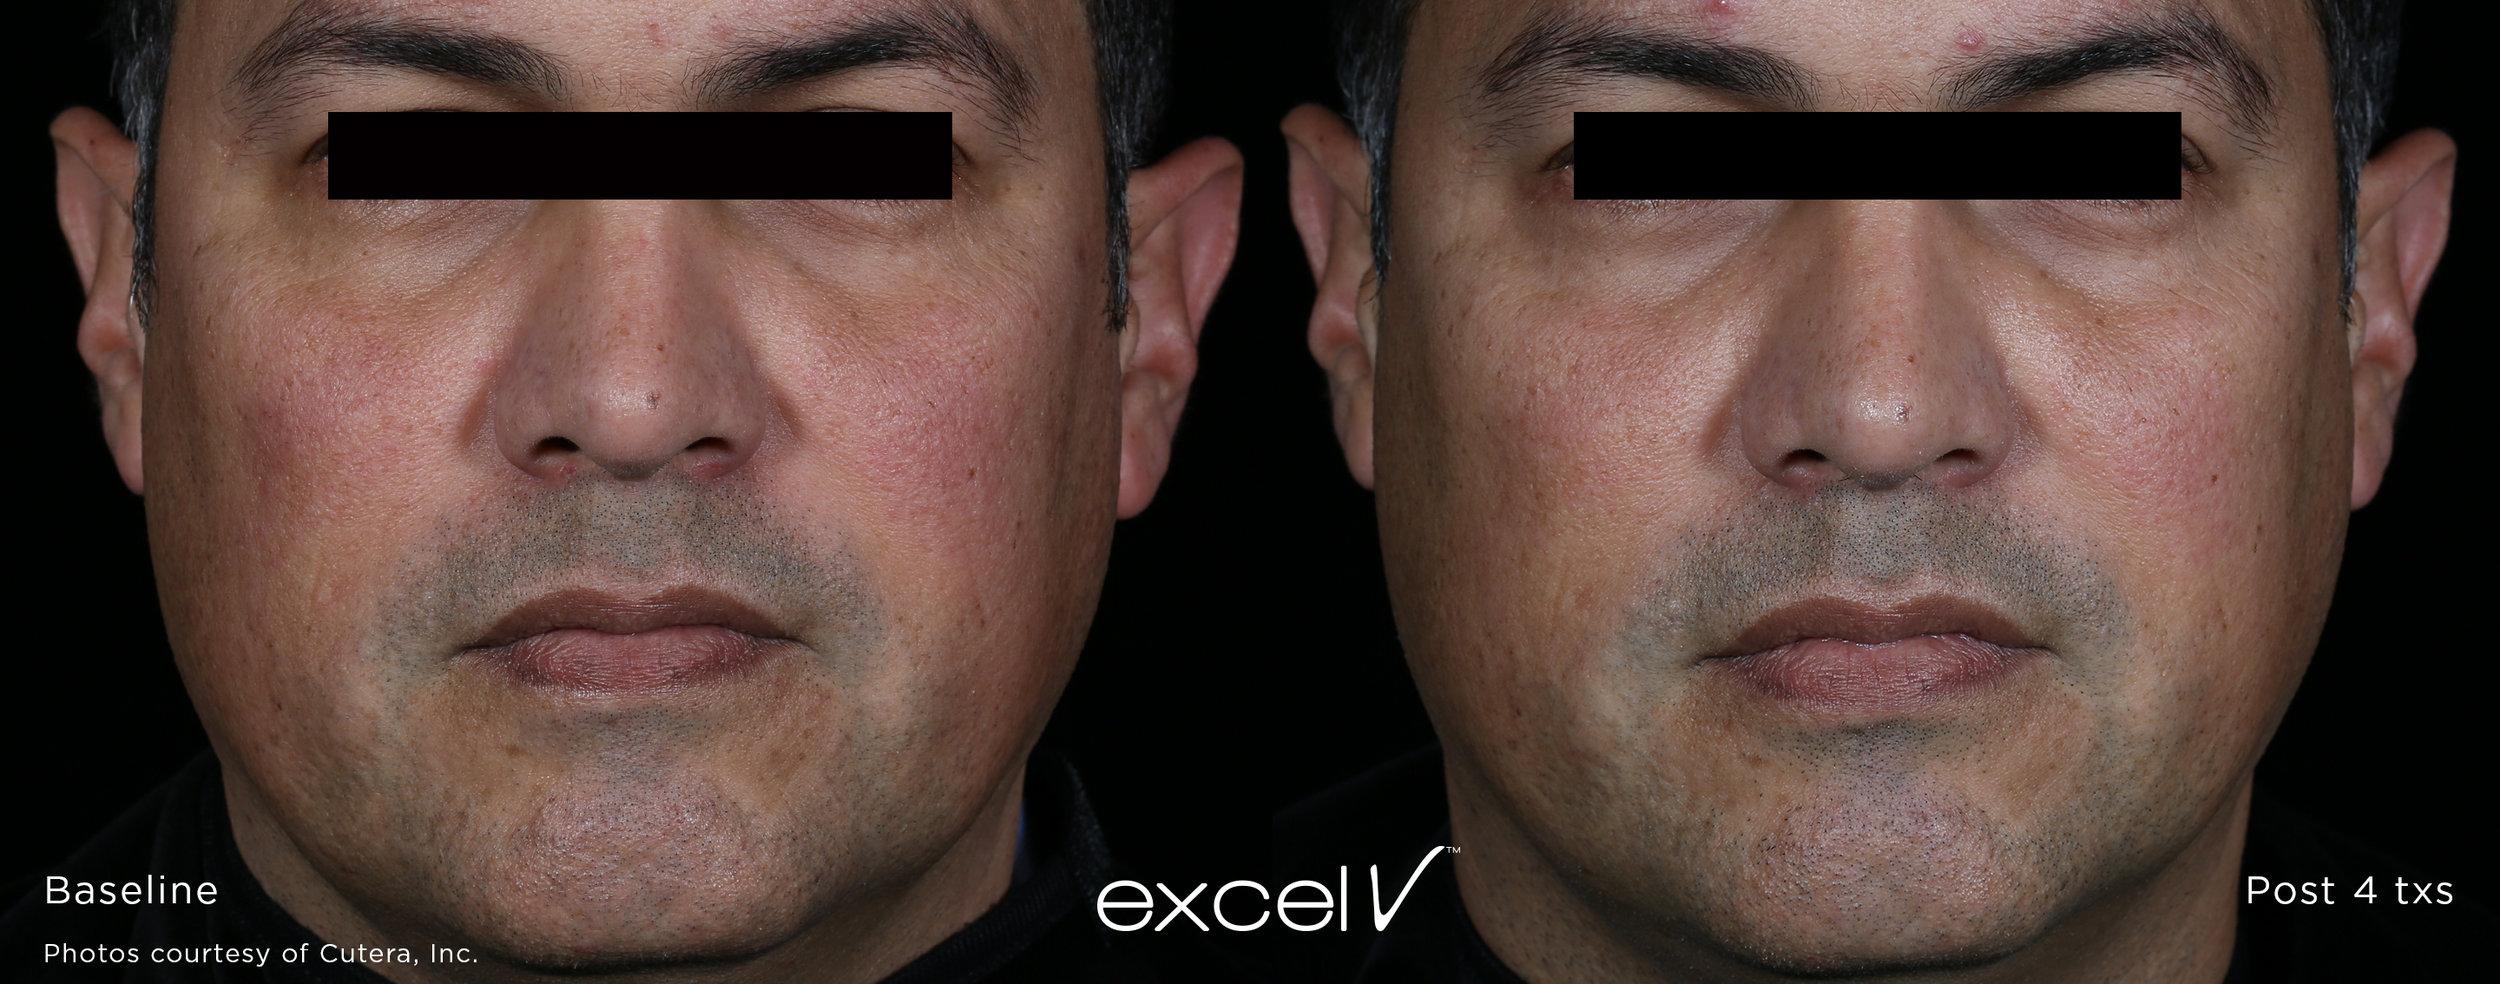 excelV_LG_Revitalization_1.jpg